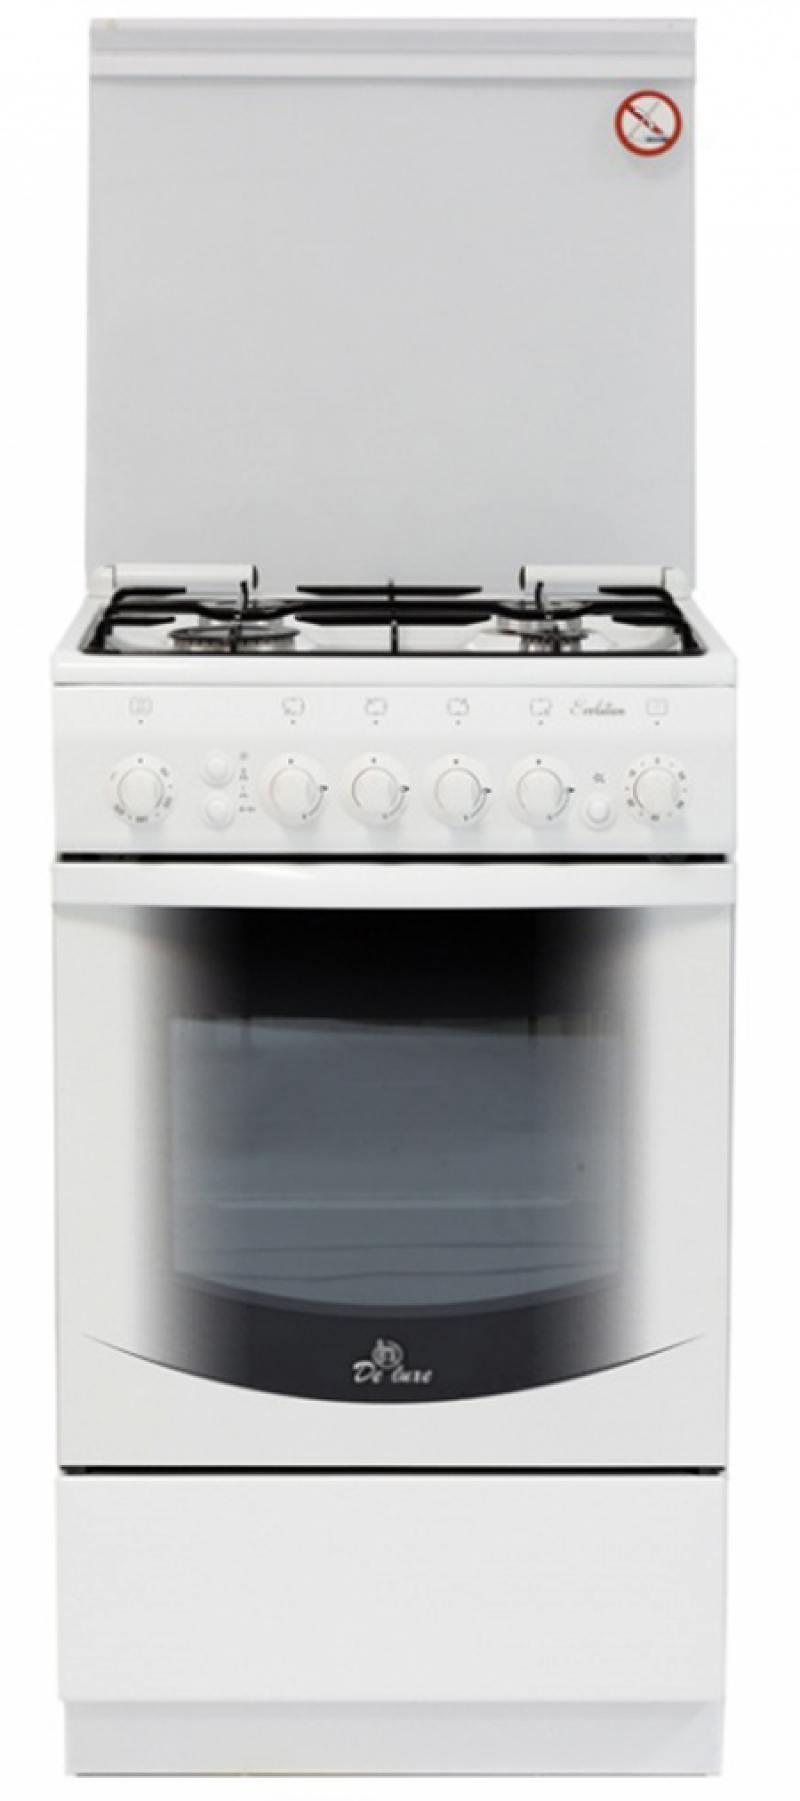 Газовая плита De Luxe 5040.31г камины ewt ventosa de luxe